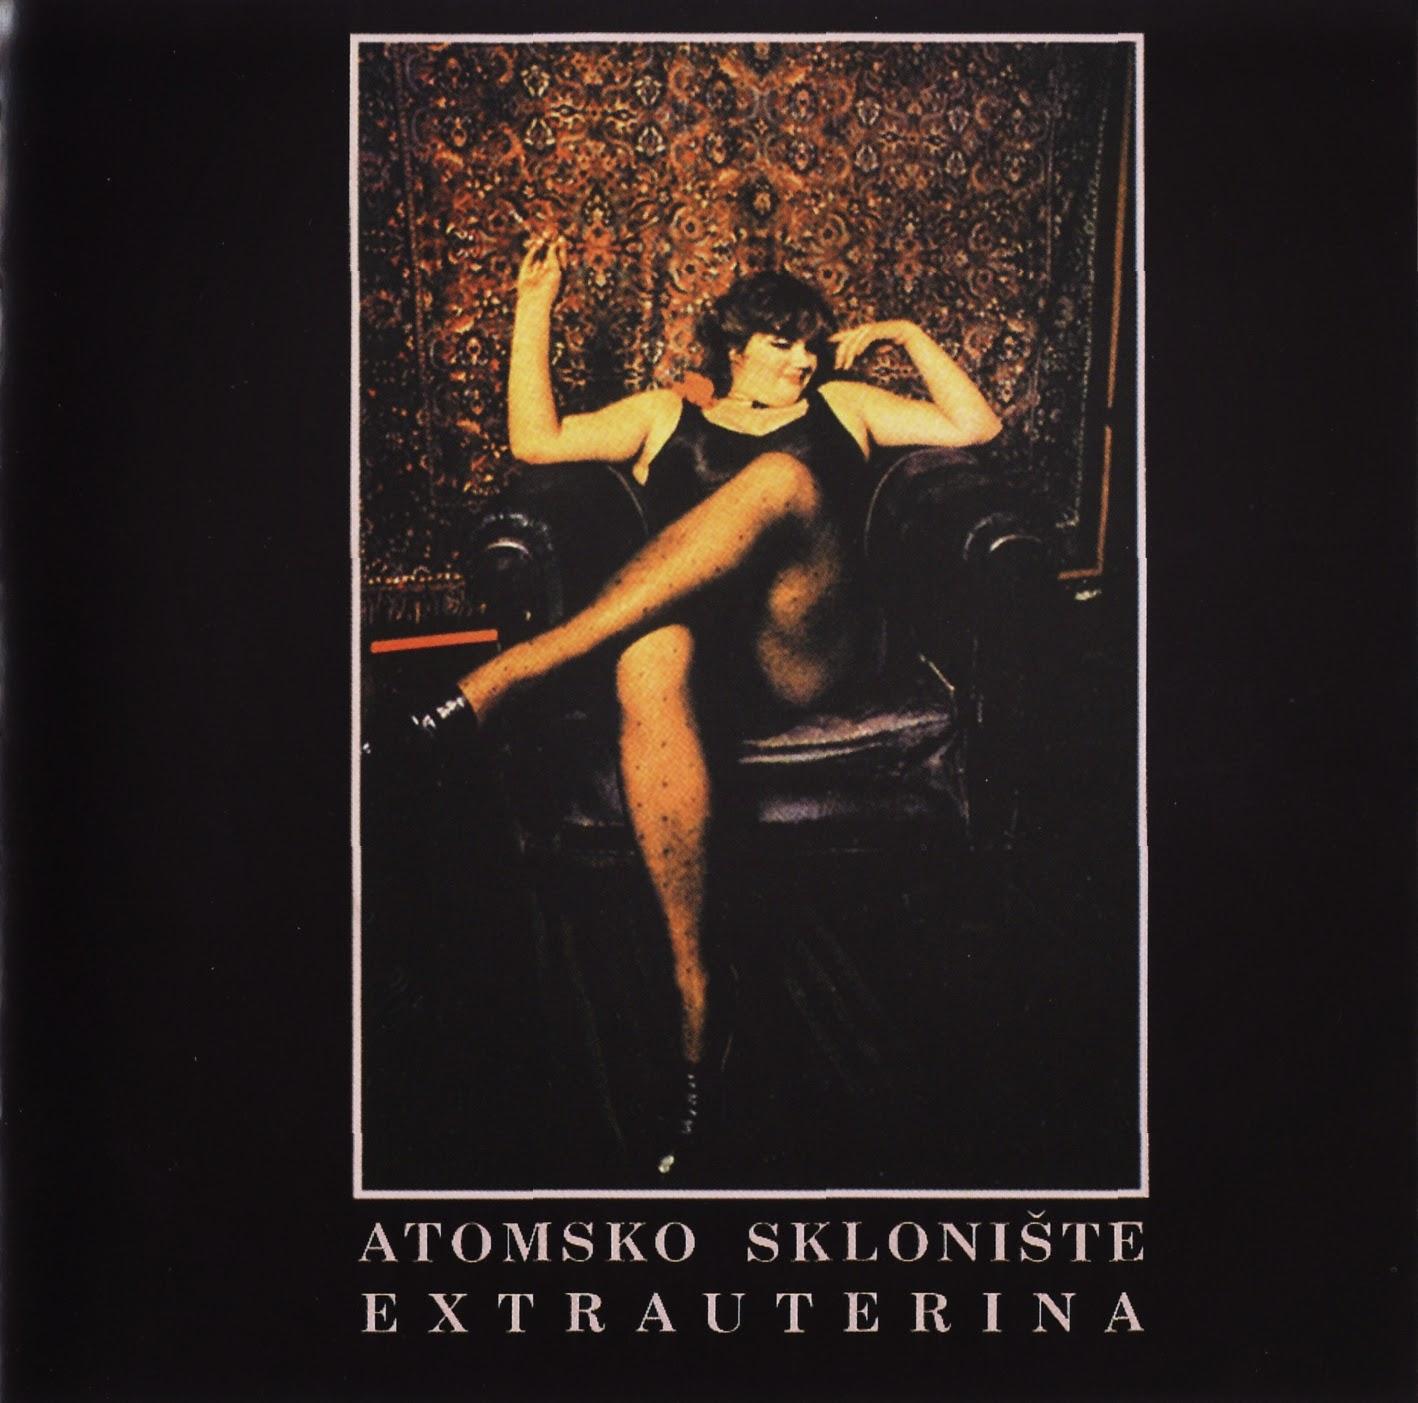 Atomsko Skloniste - Diskografija (1978-1995)  Atomsko+skloniste+-+Extrauterina+f